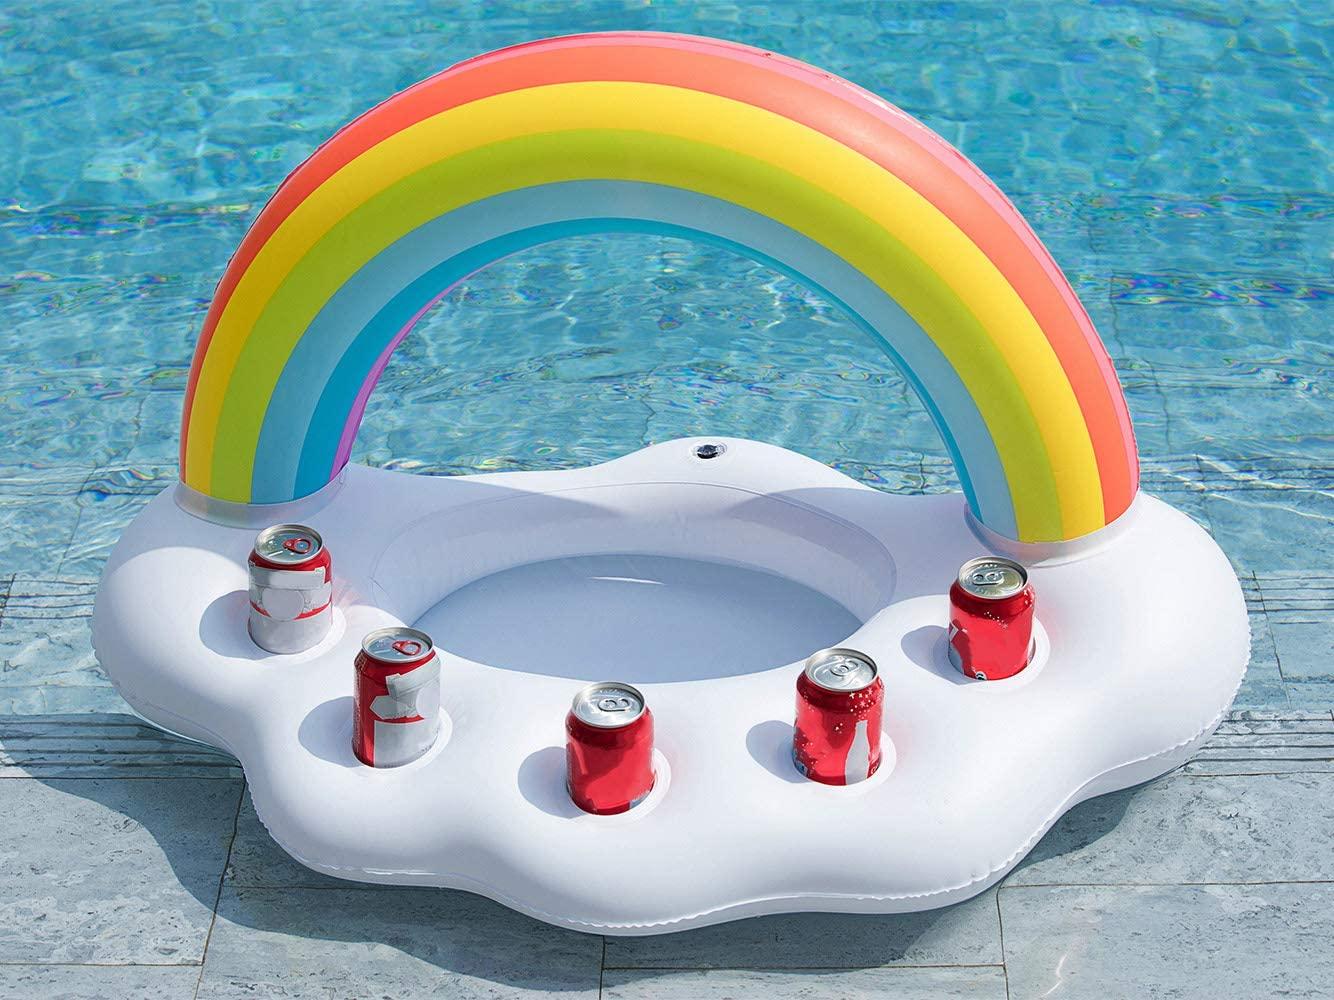 Jasonwell Inflatable Rainbow Cloud Floating Cooler Drink Holder